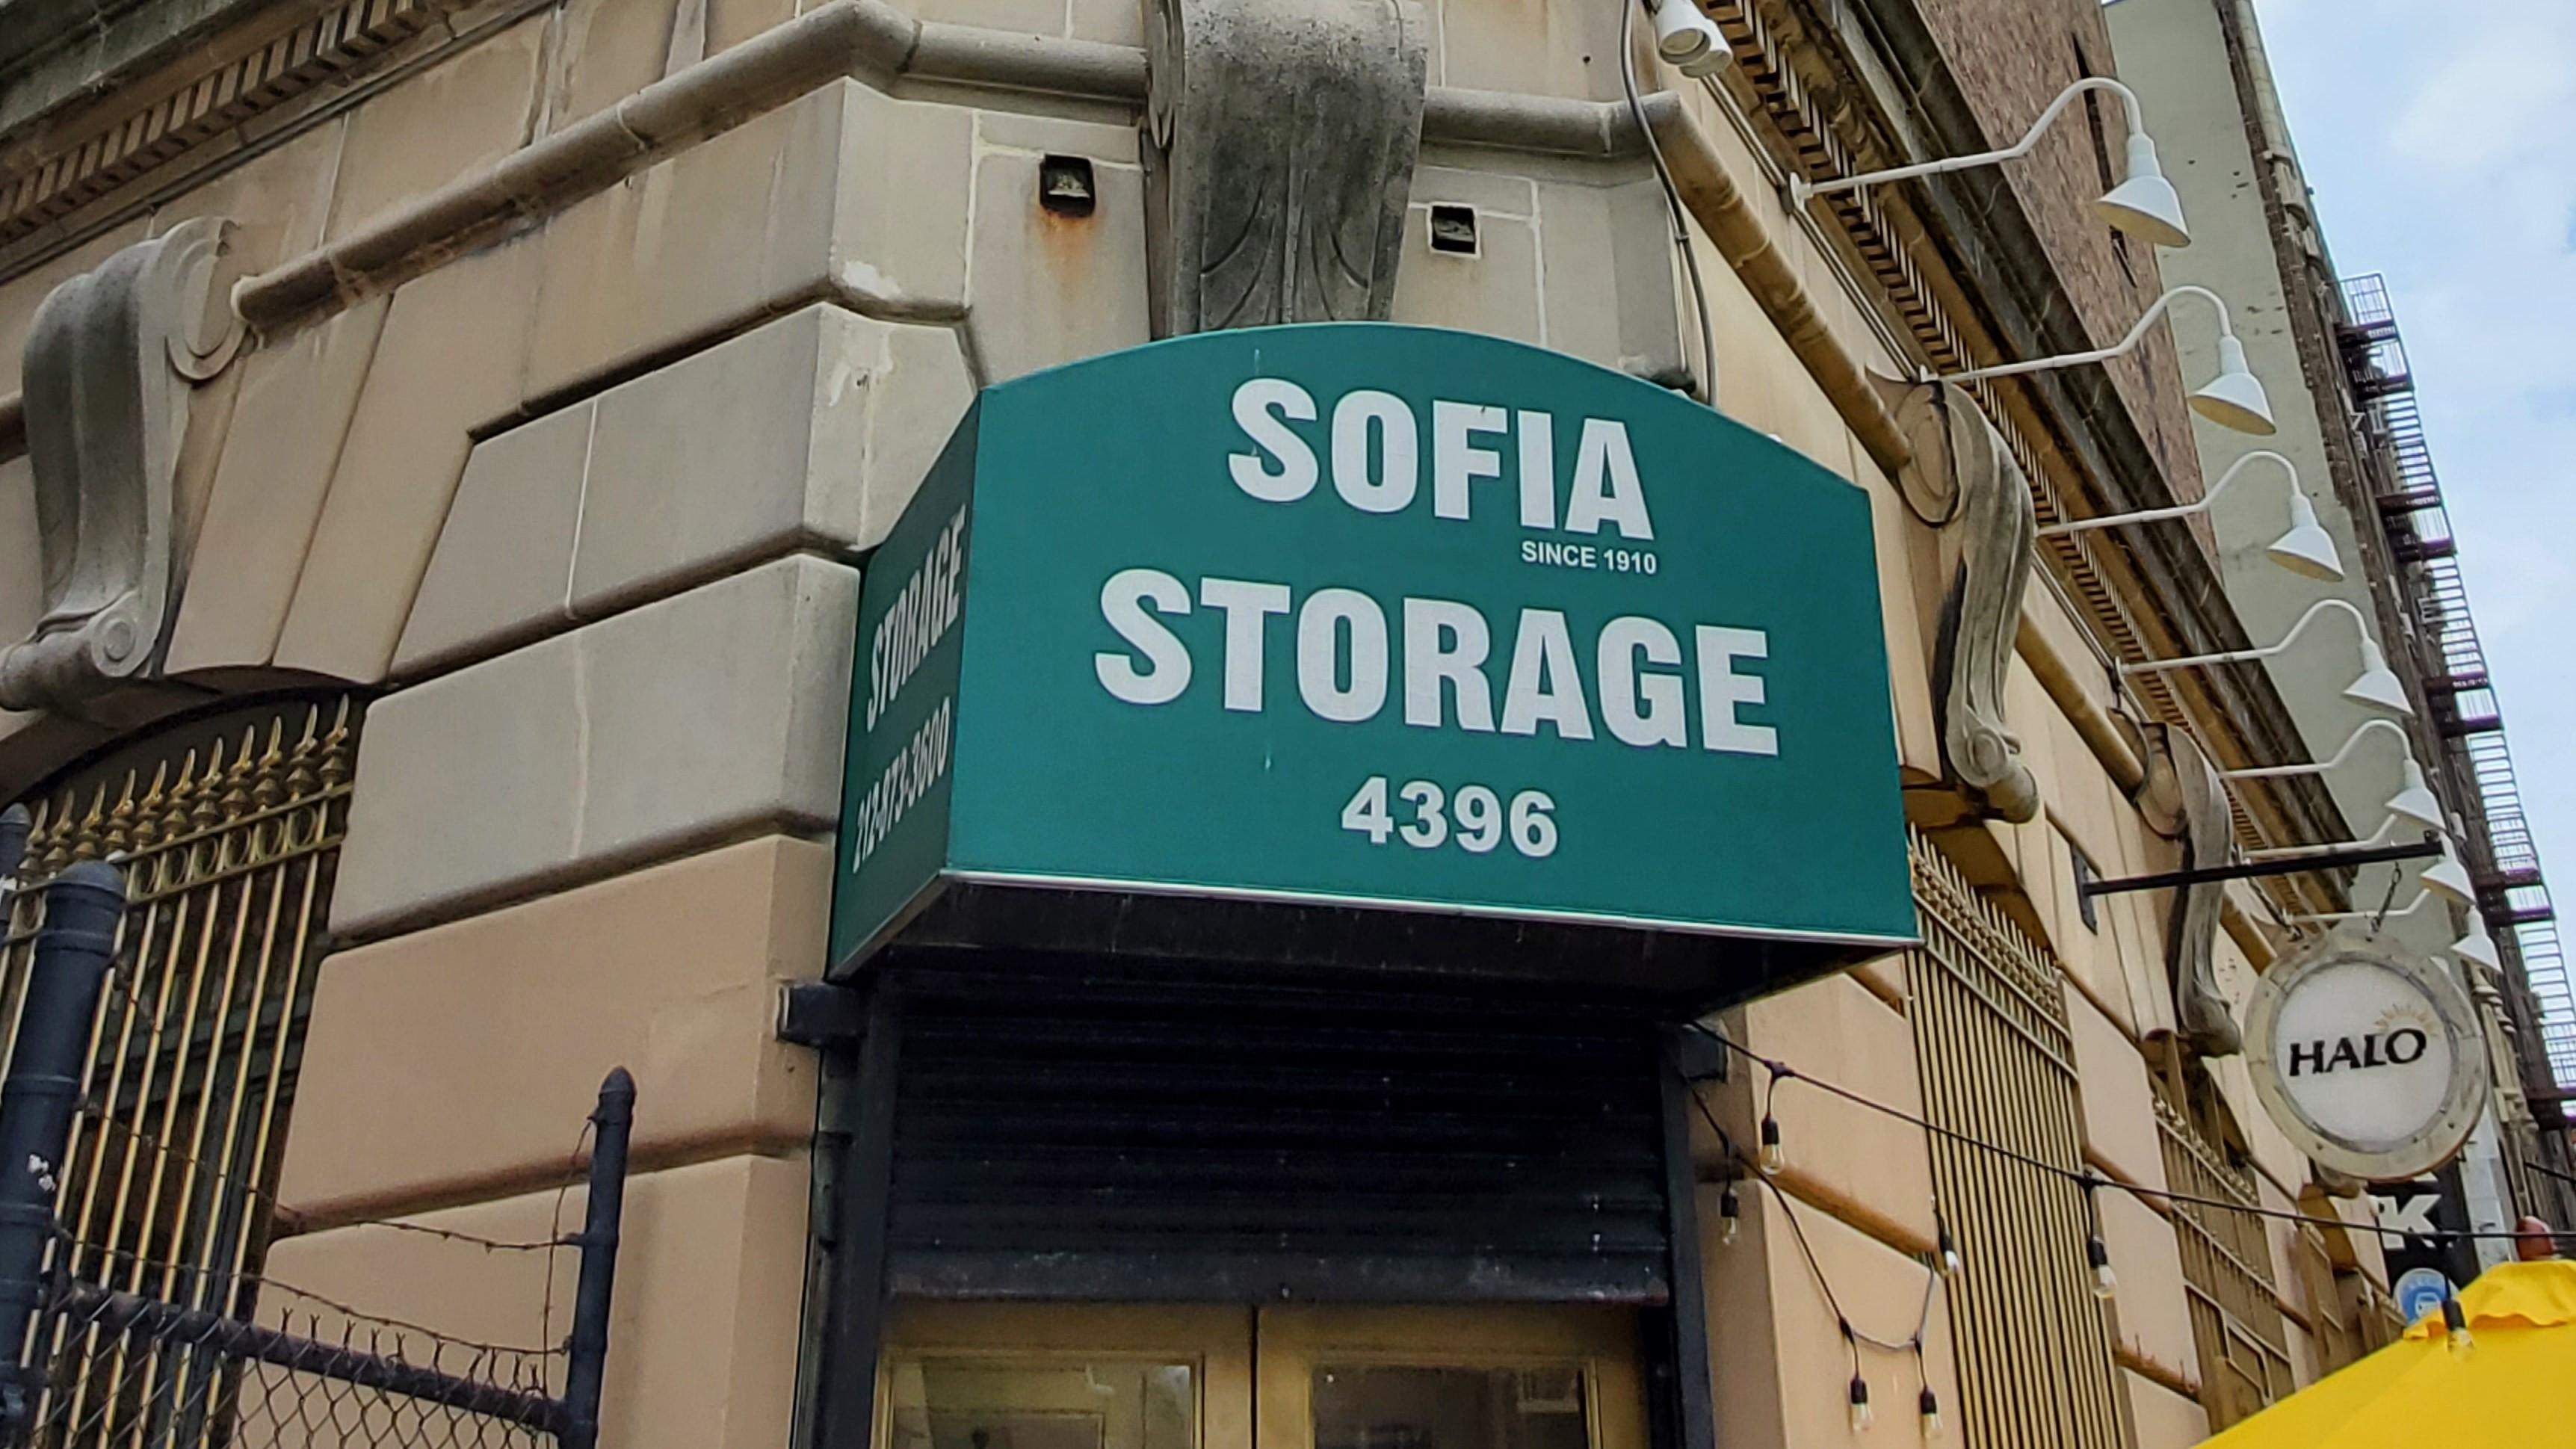 front entrance to sofia storage center